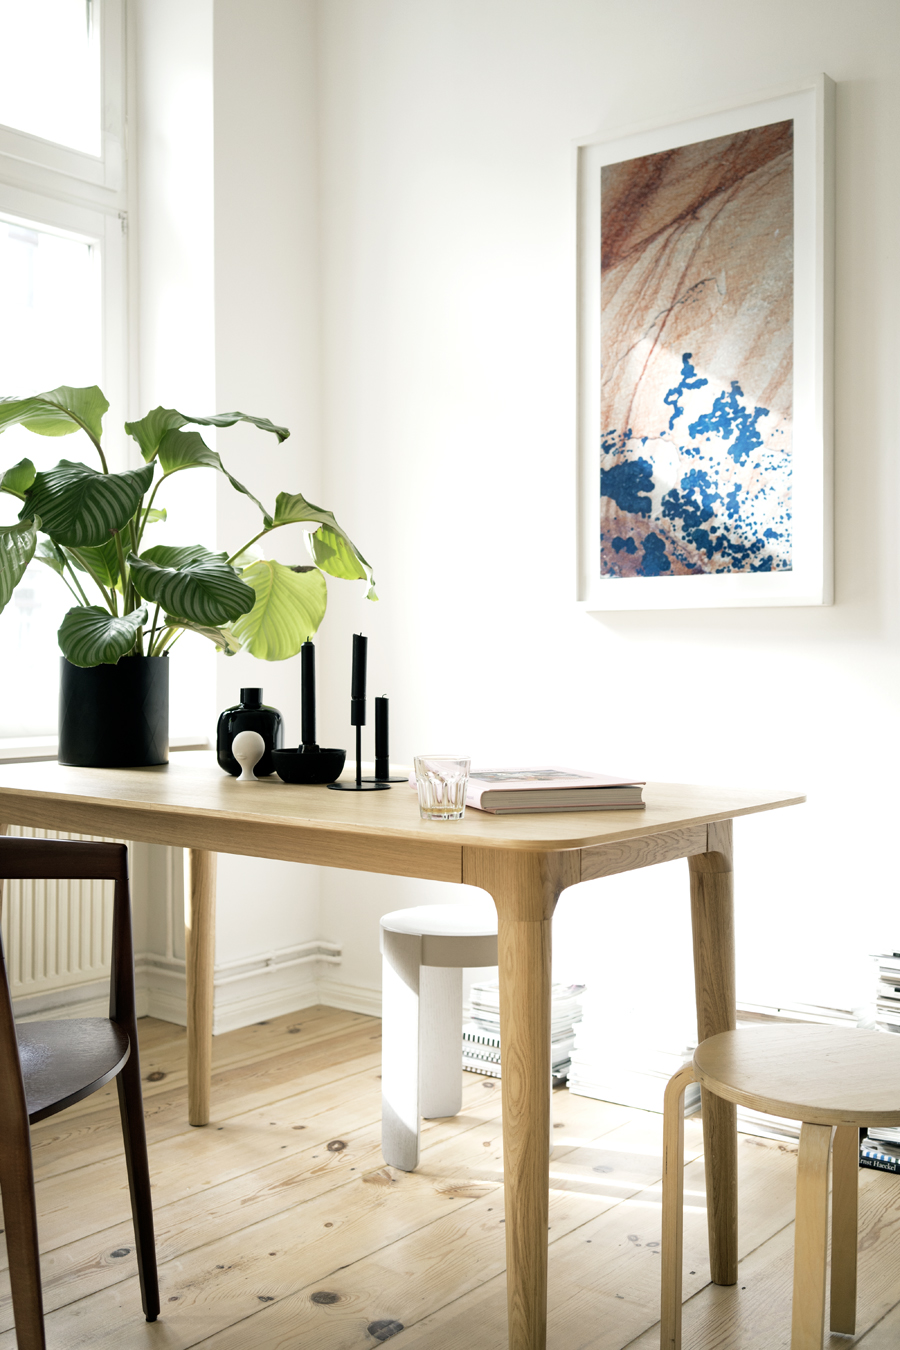 tylko neues m bel label zum selbermachen kooye. Black Bedroom Furniture Sets. Home Design Ideas